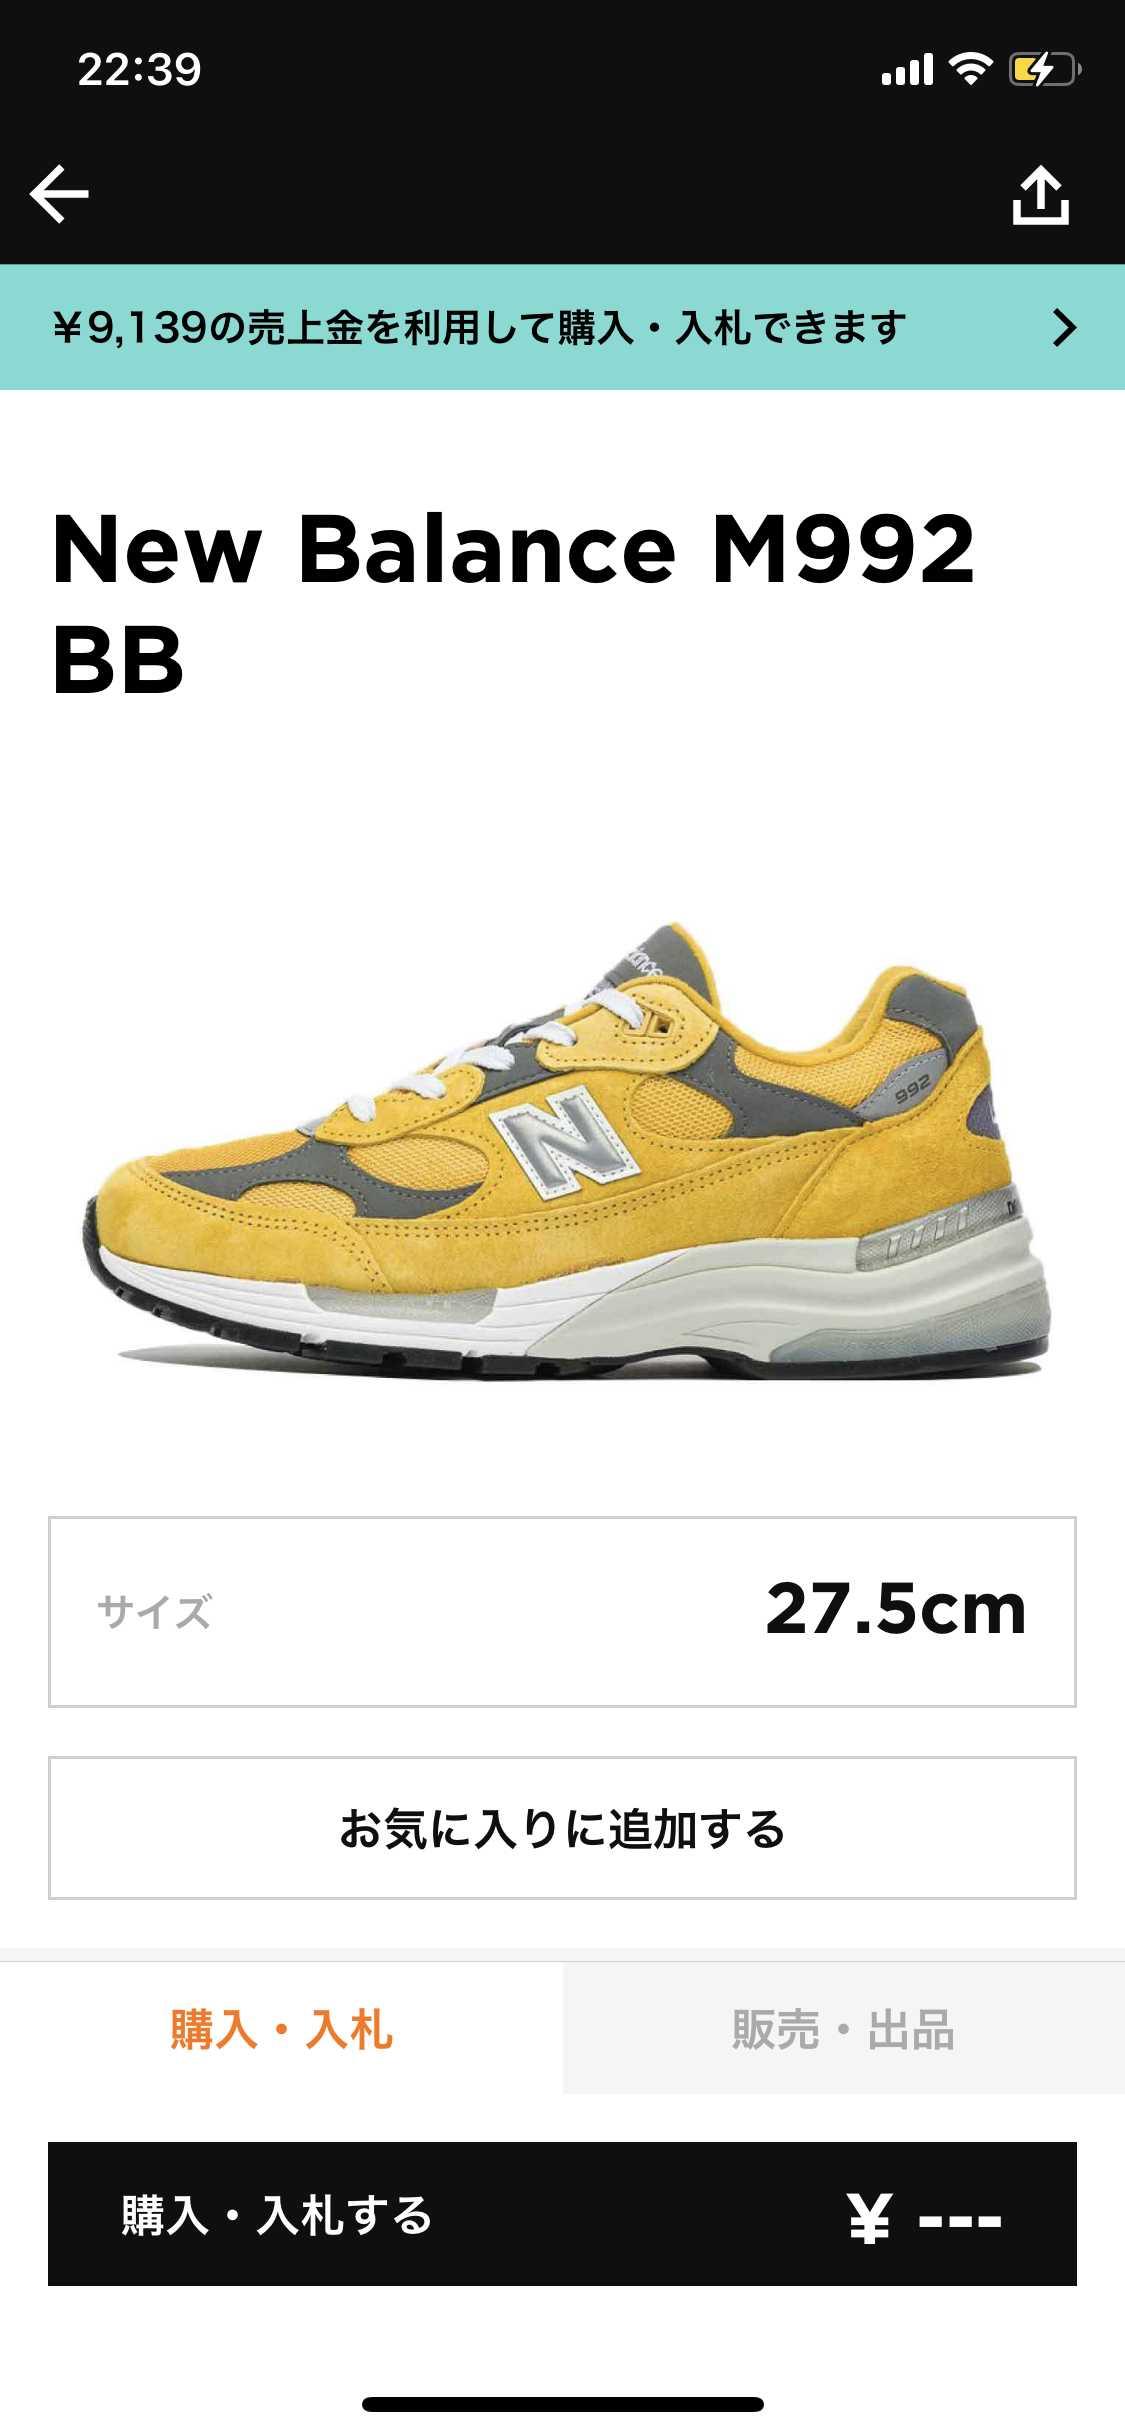 New Balance 992 BB